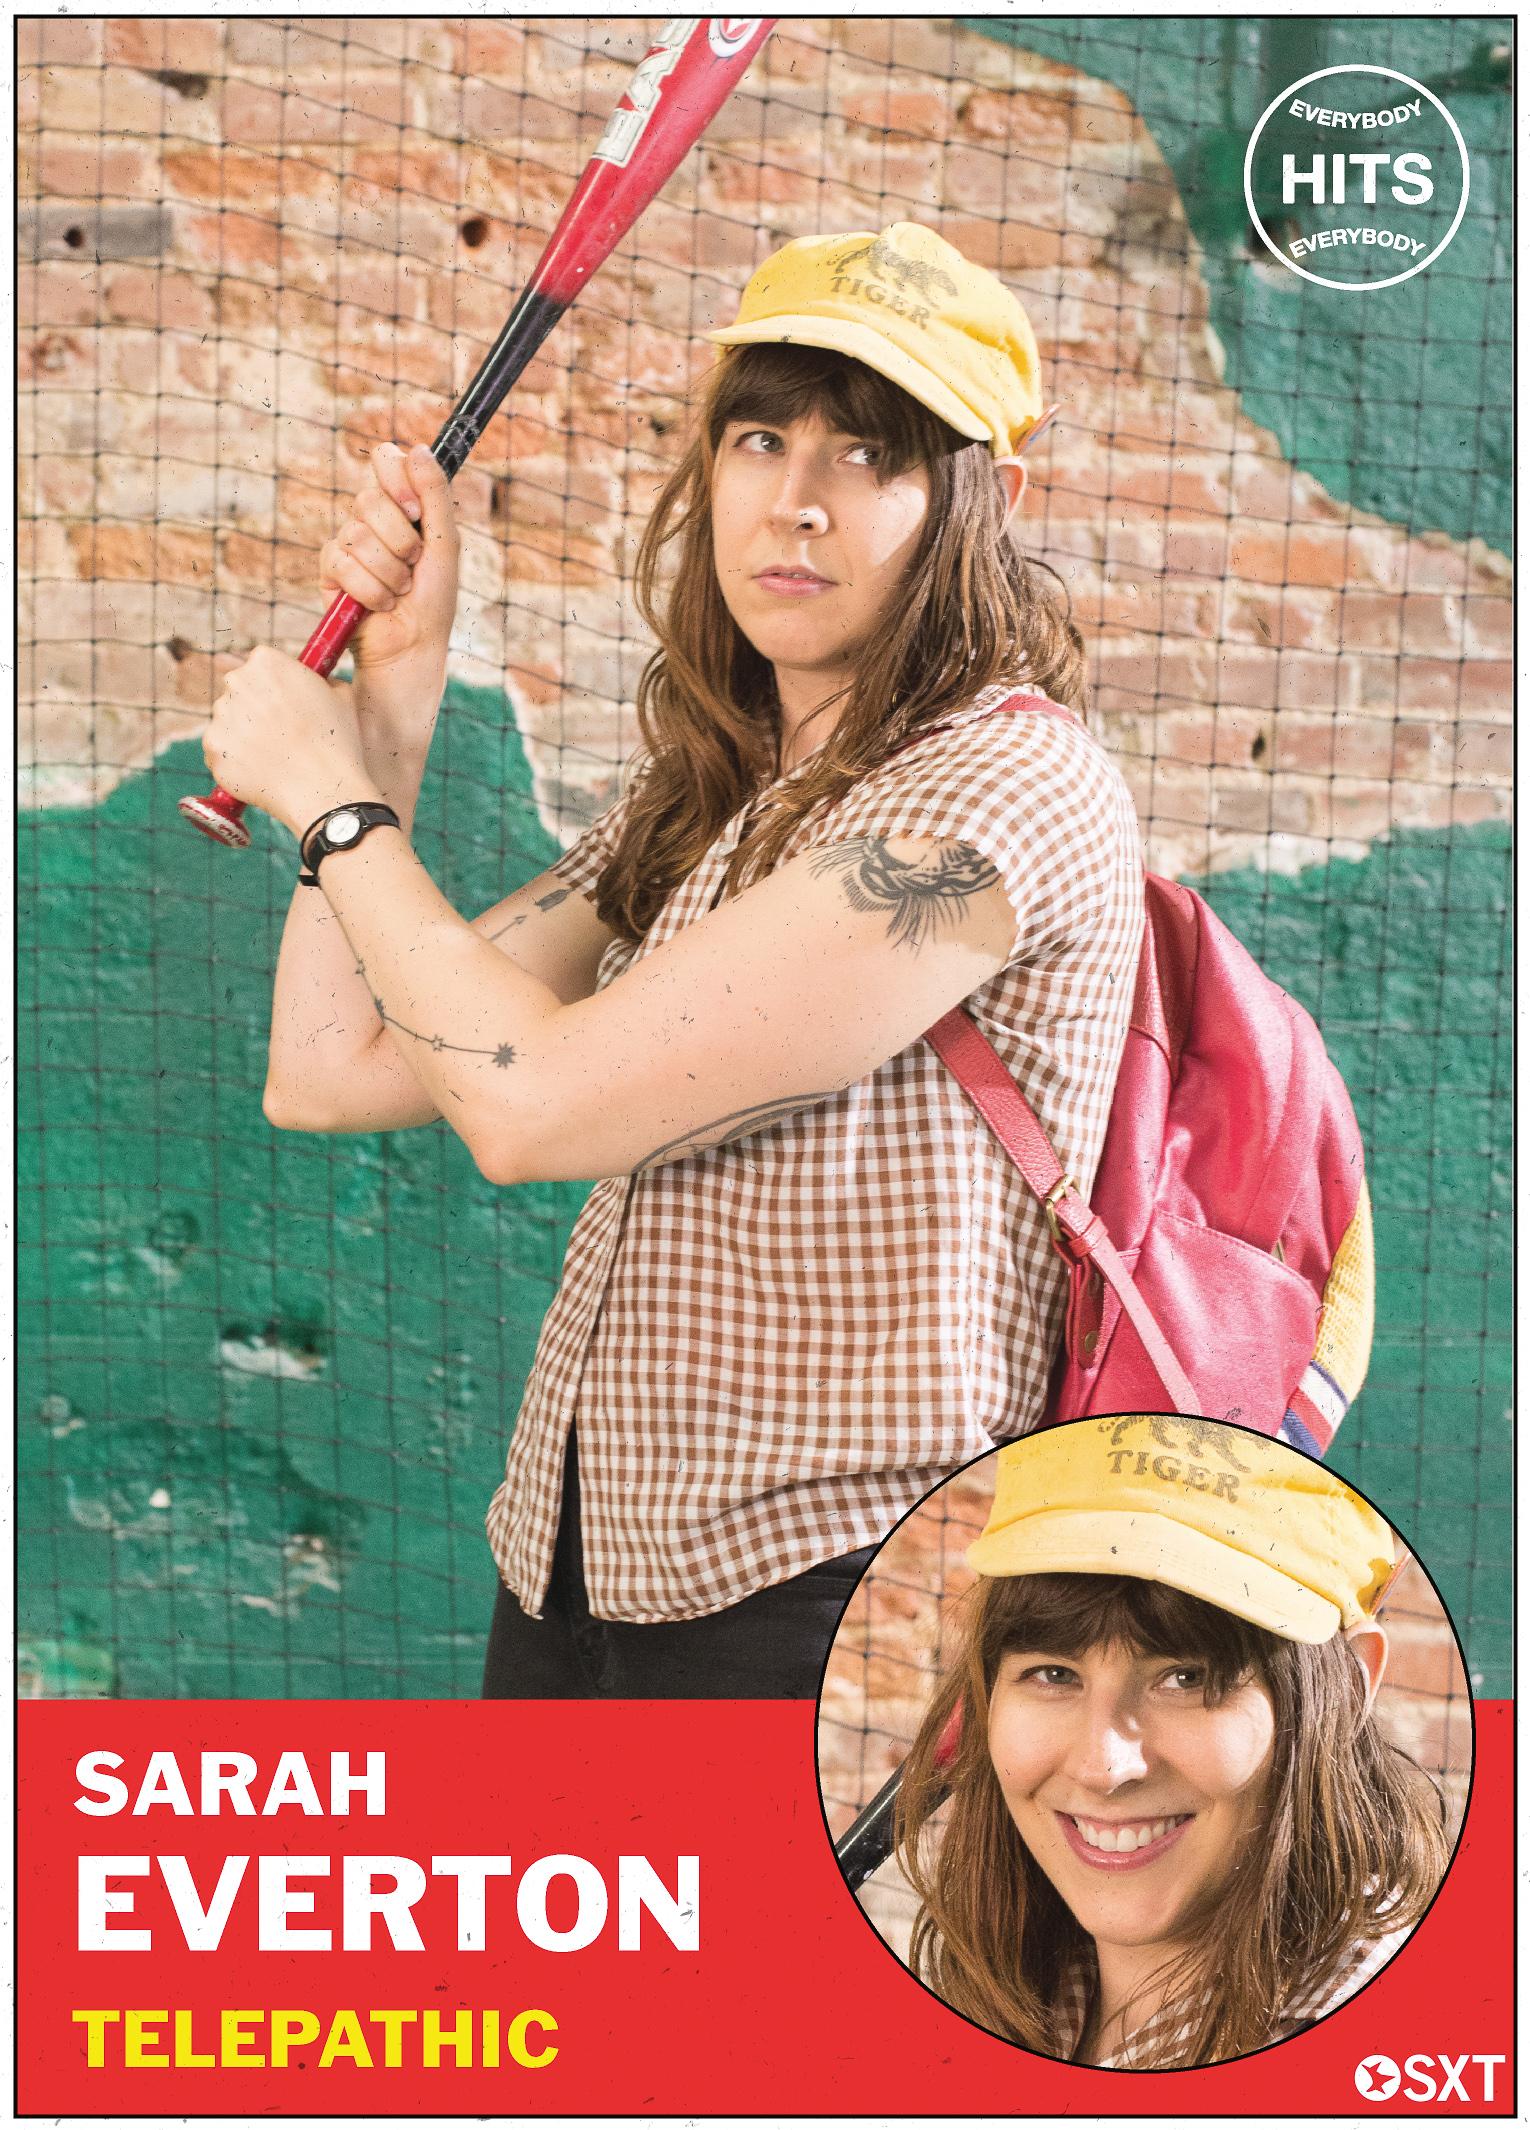 Sarah Everton of Telepathic